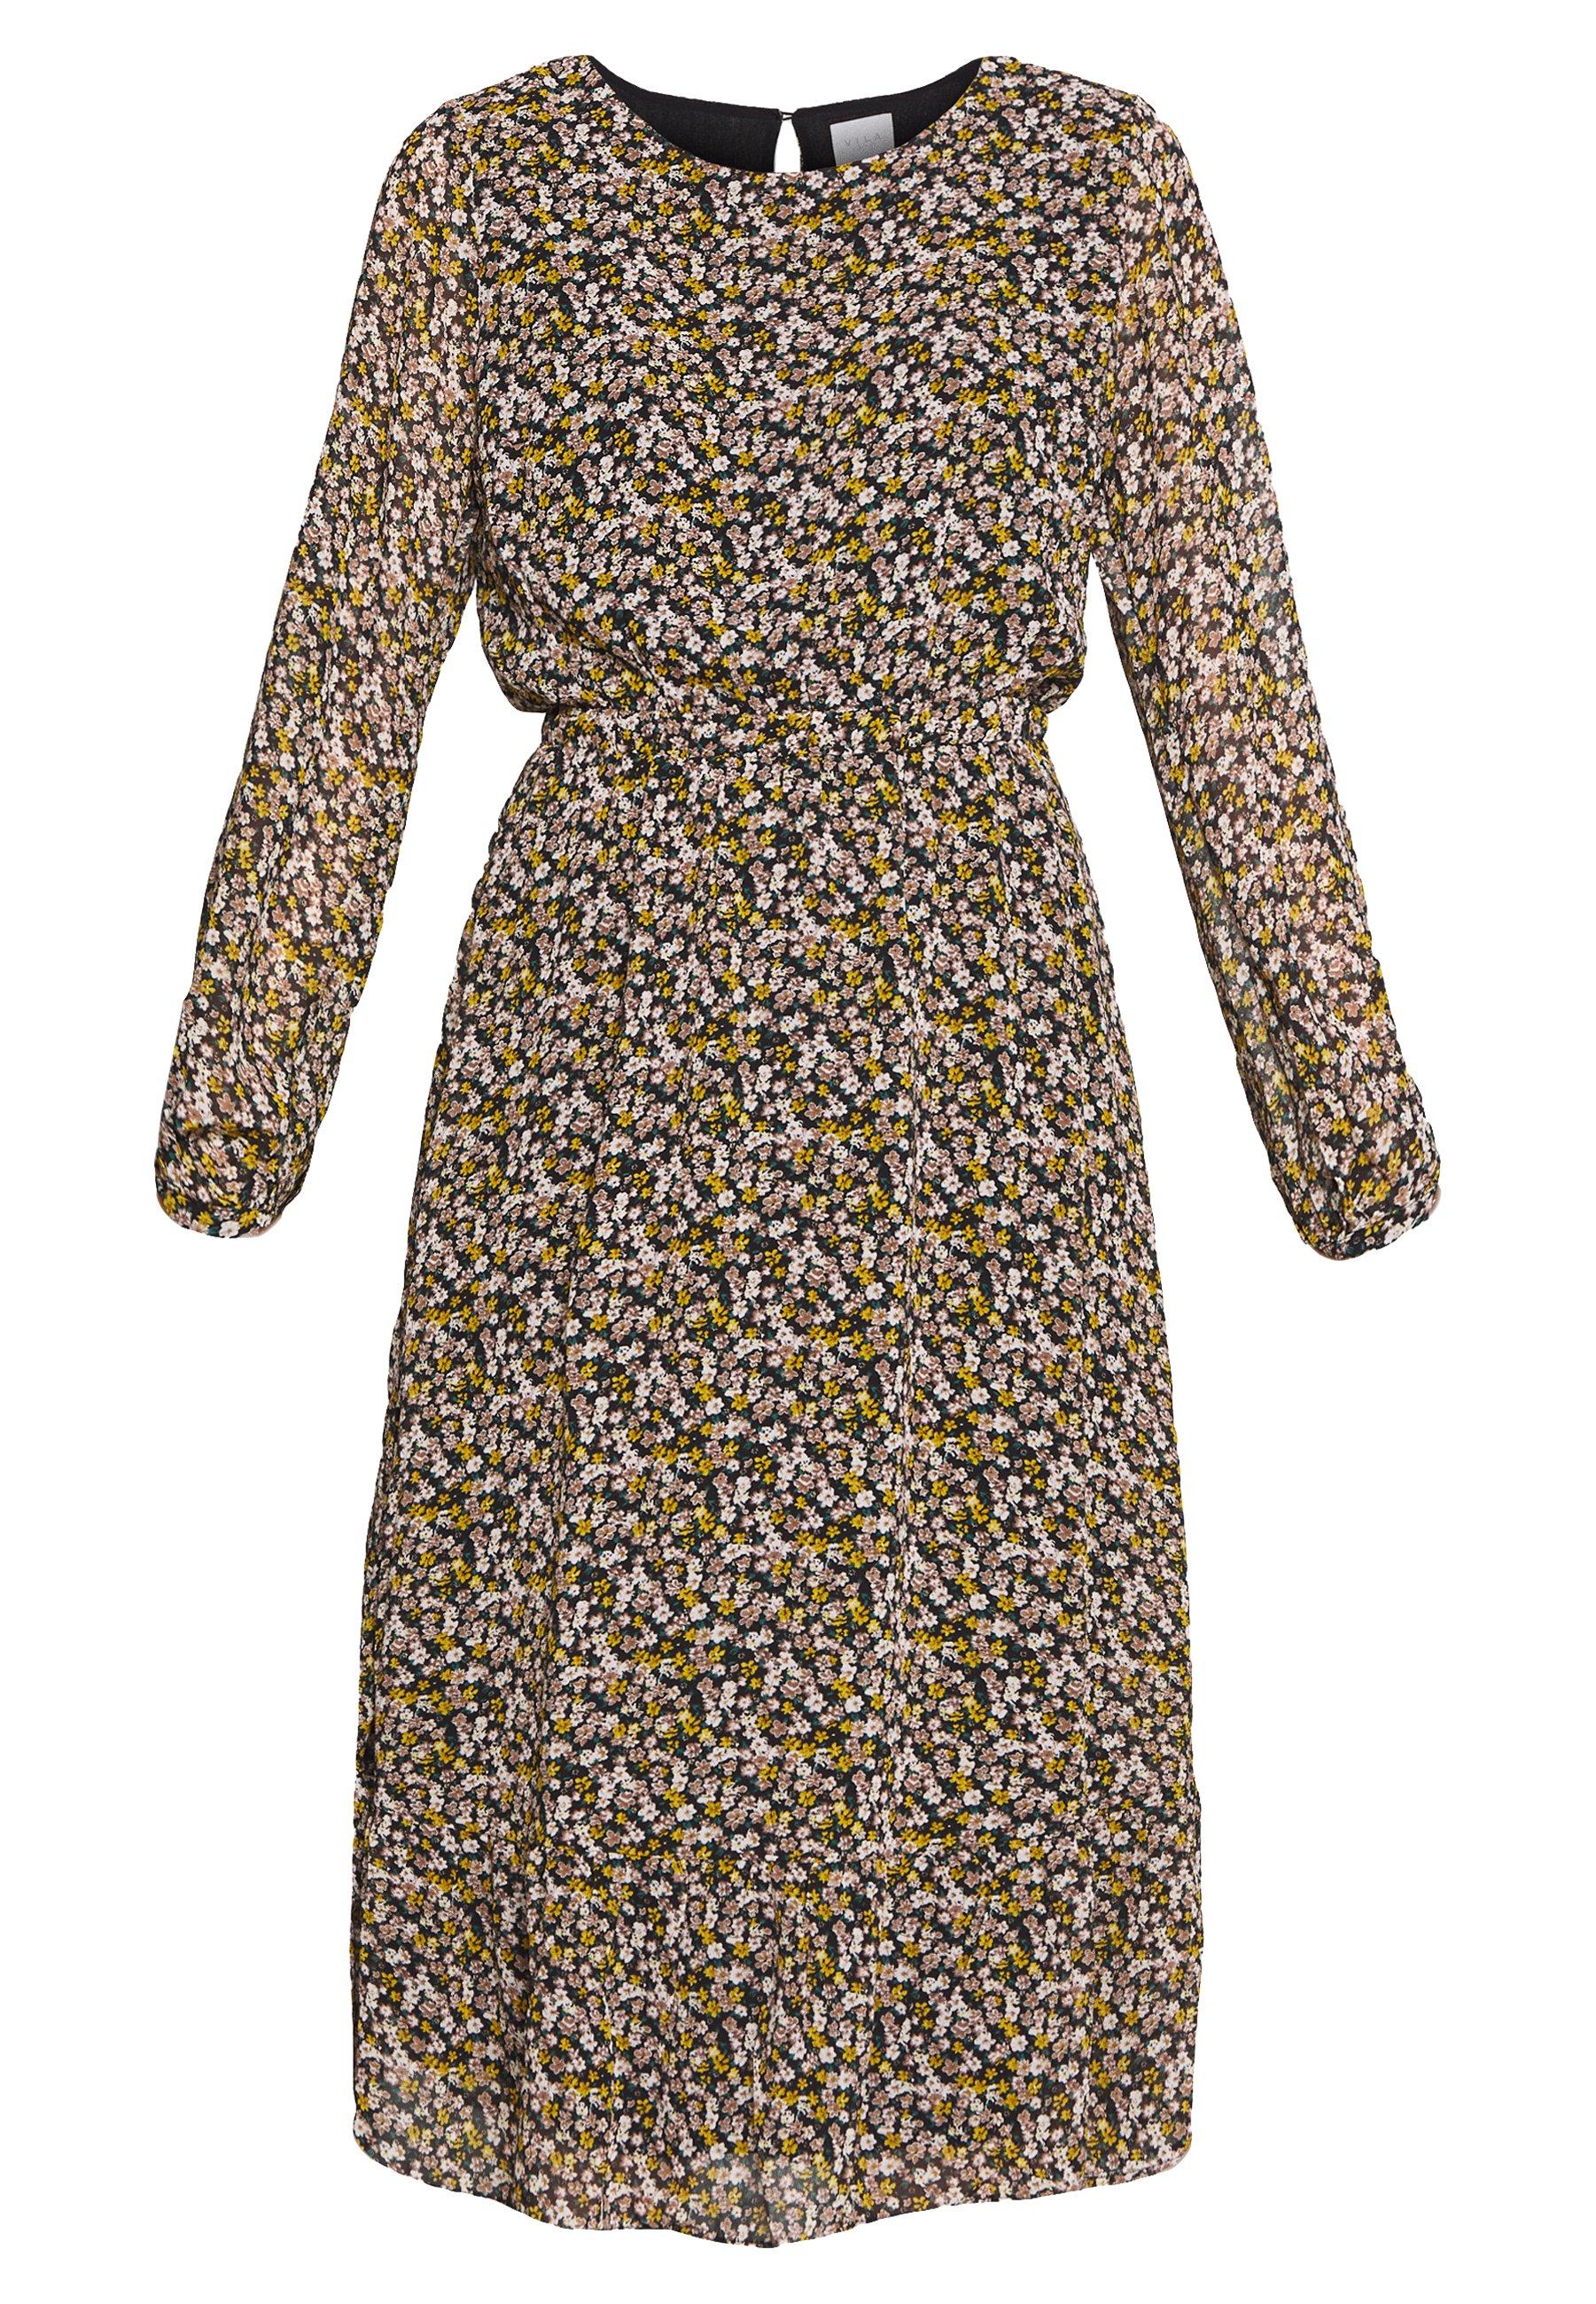 Vila VIELINA FLOWER DRESS - Sukienka letnia - black/flowers golden/dusty came